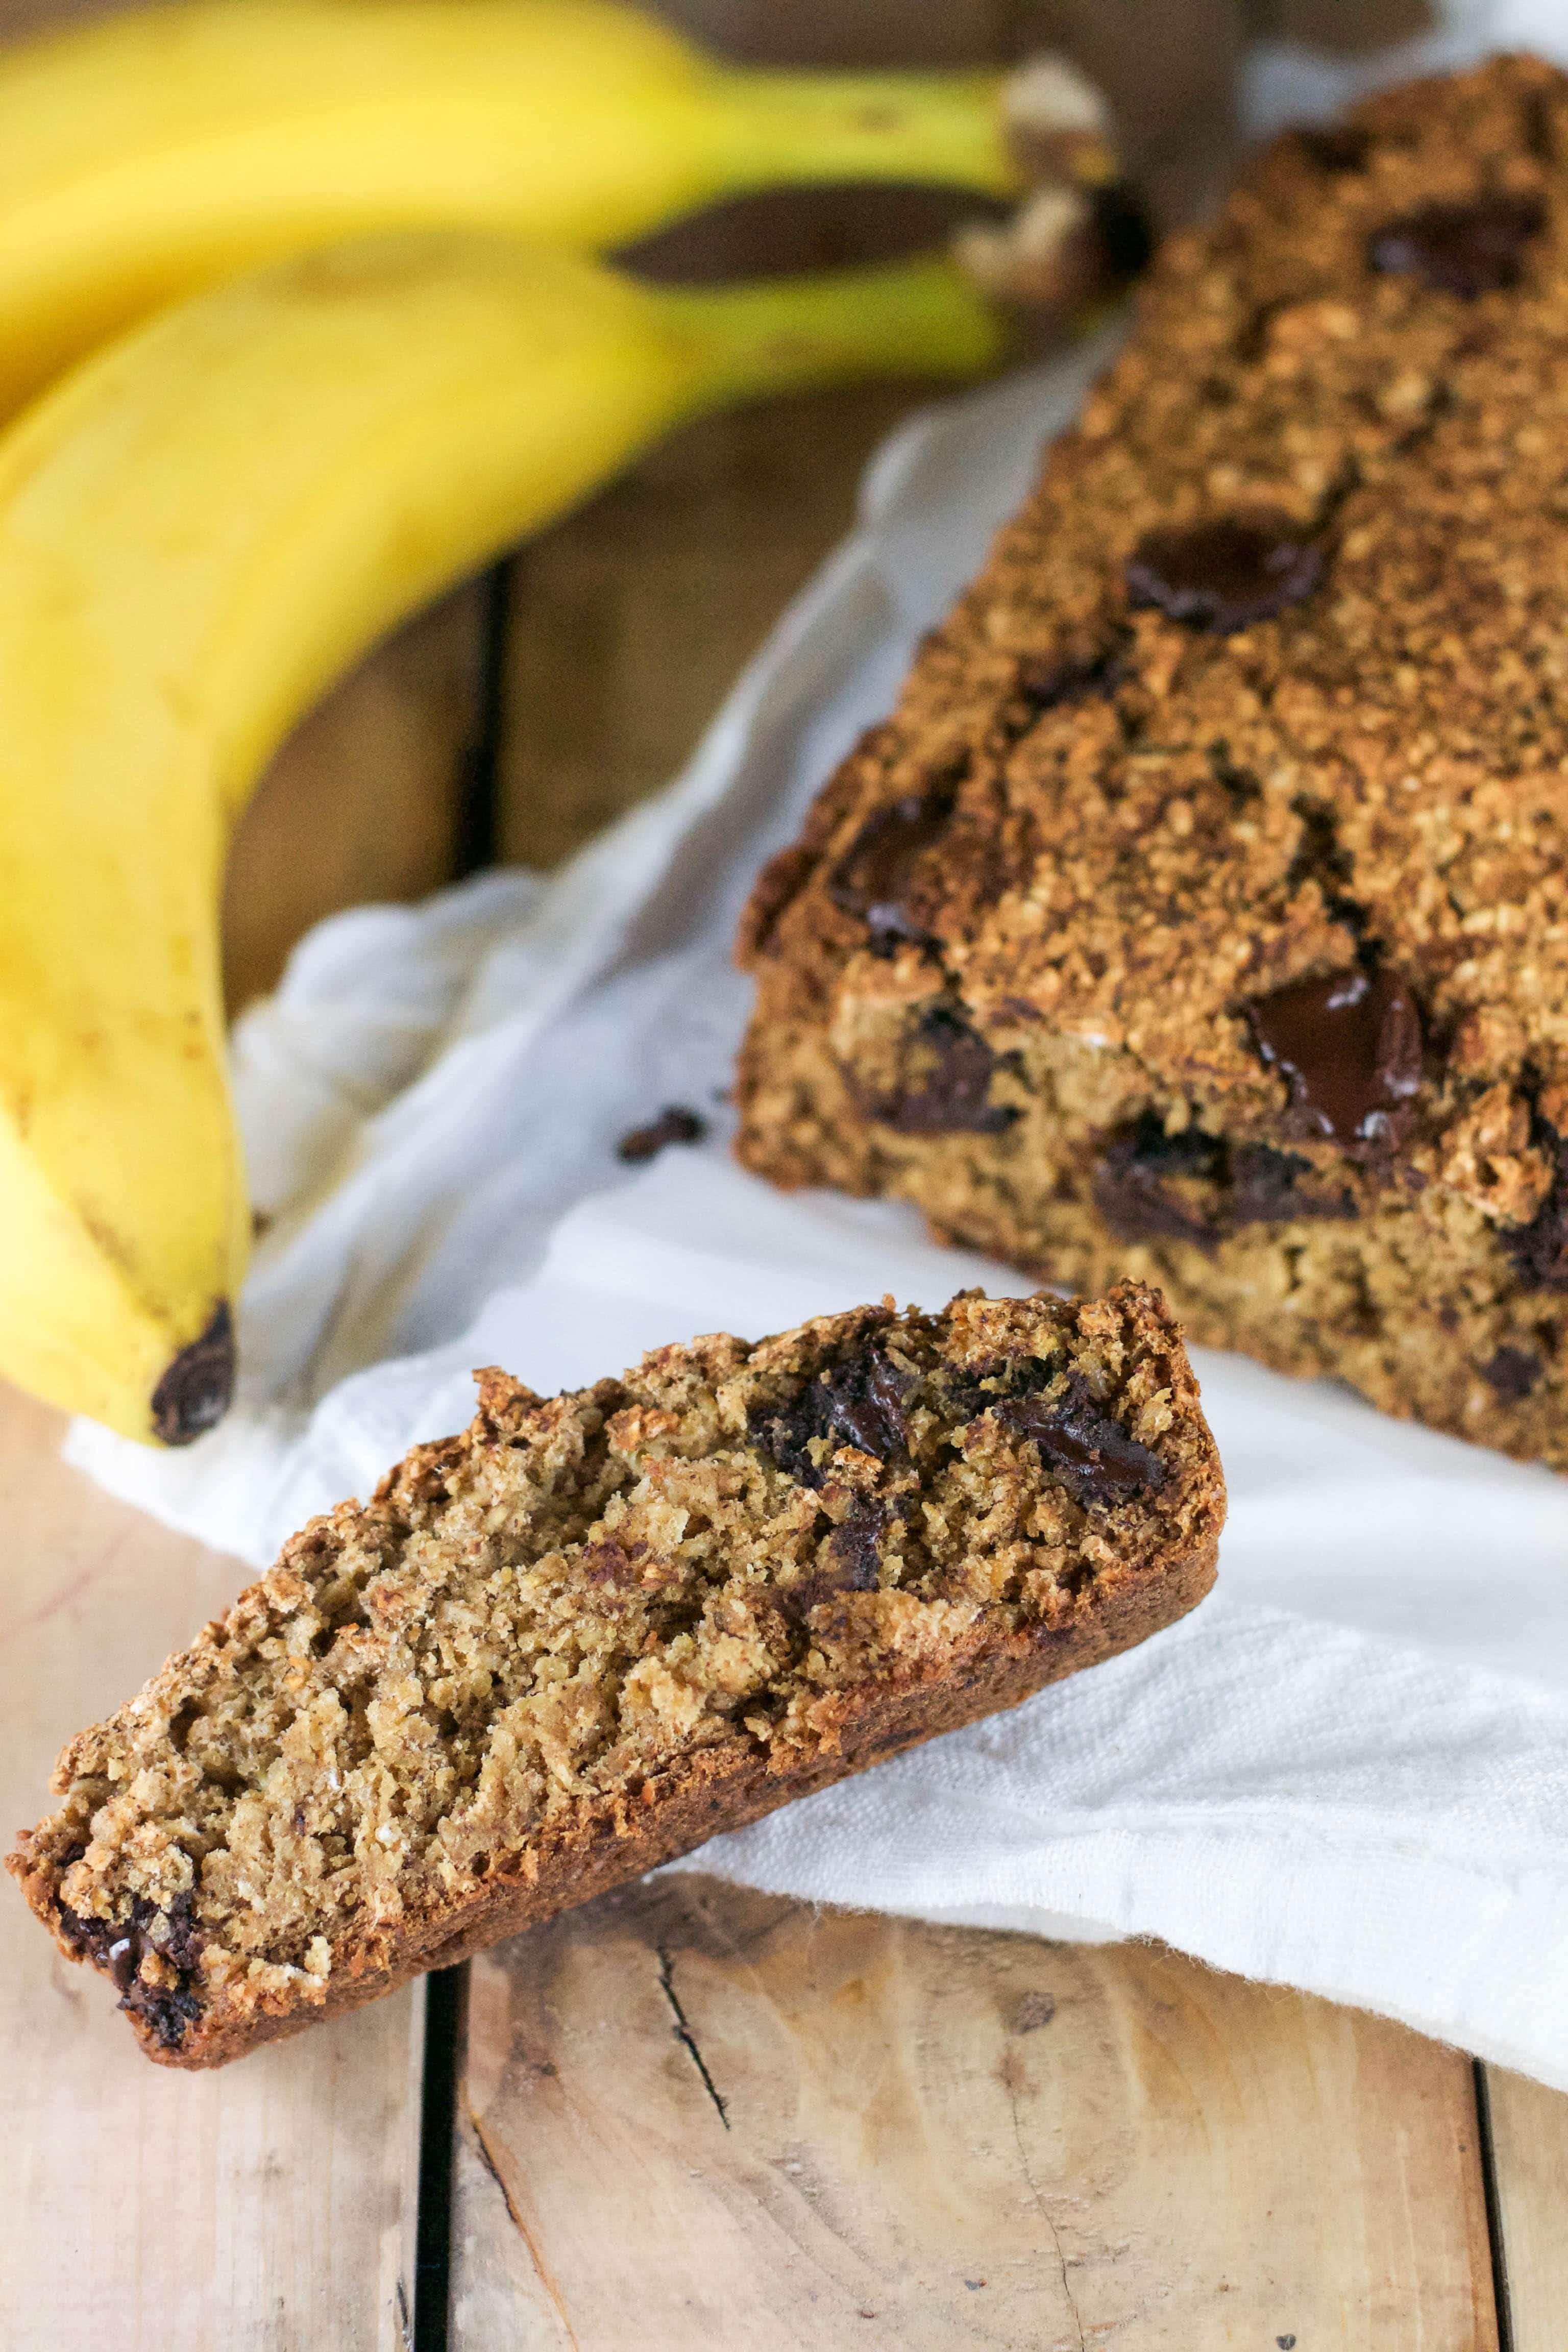 Vegan Chocolate Chunk Banana Bread (GF, DF, V, RSF) - A Dash of Megnut